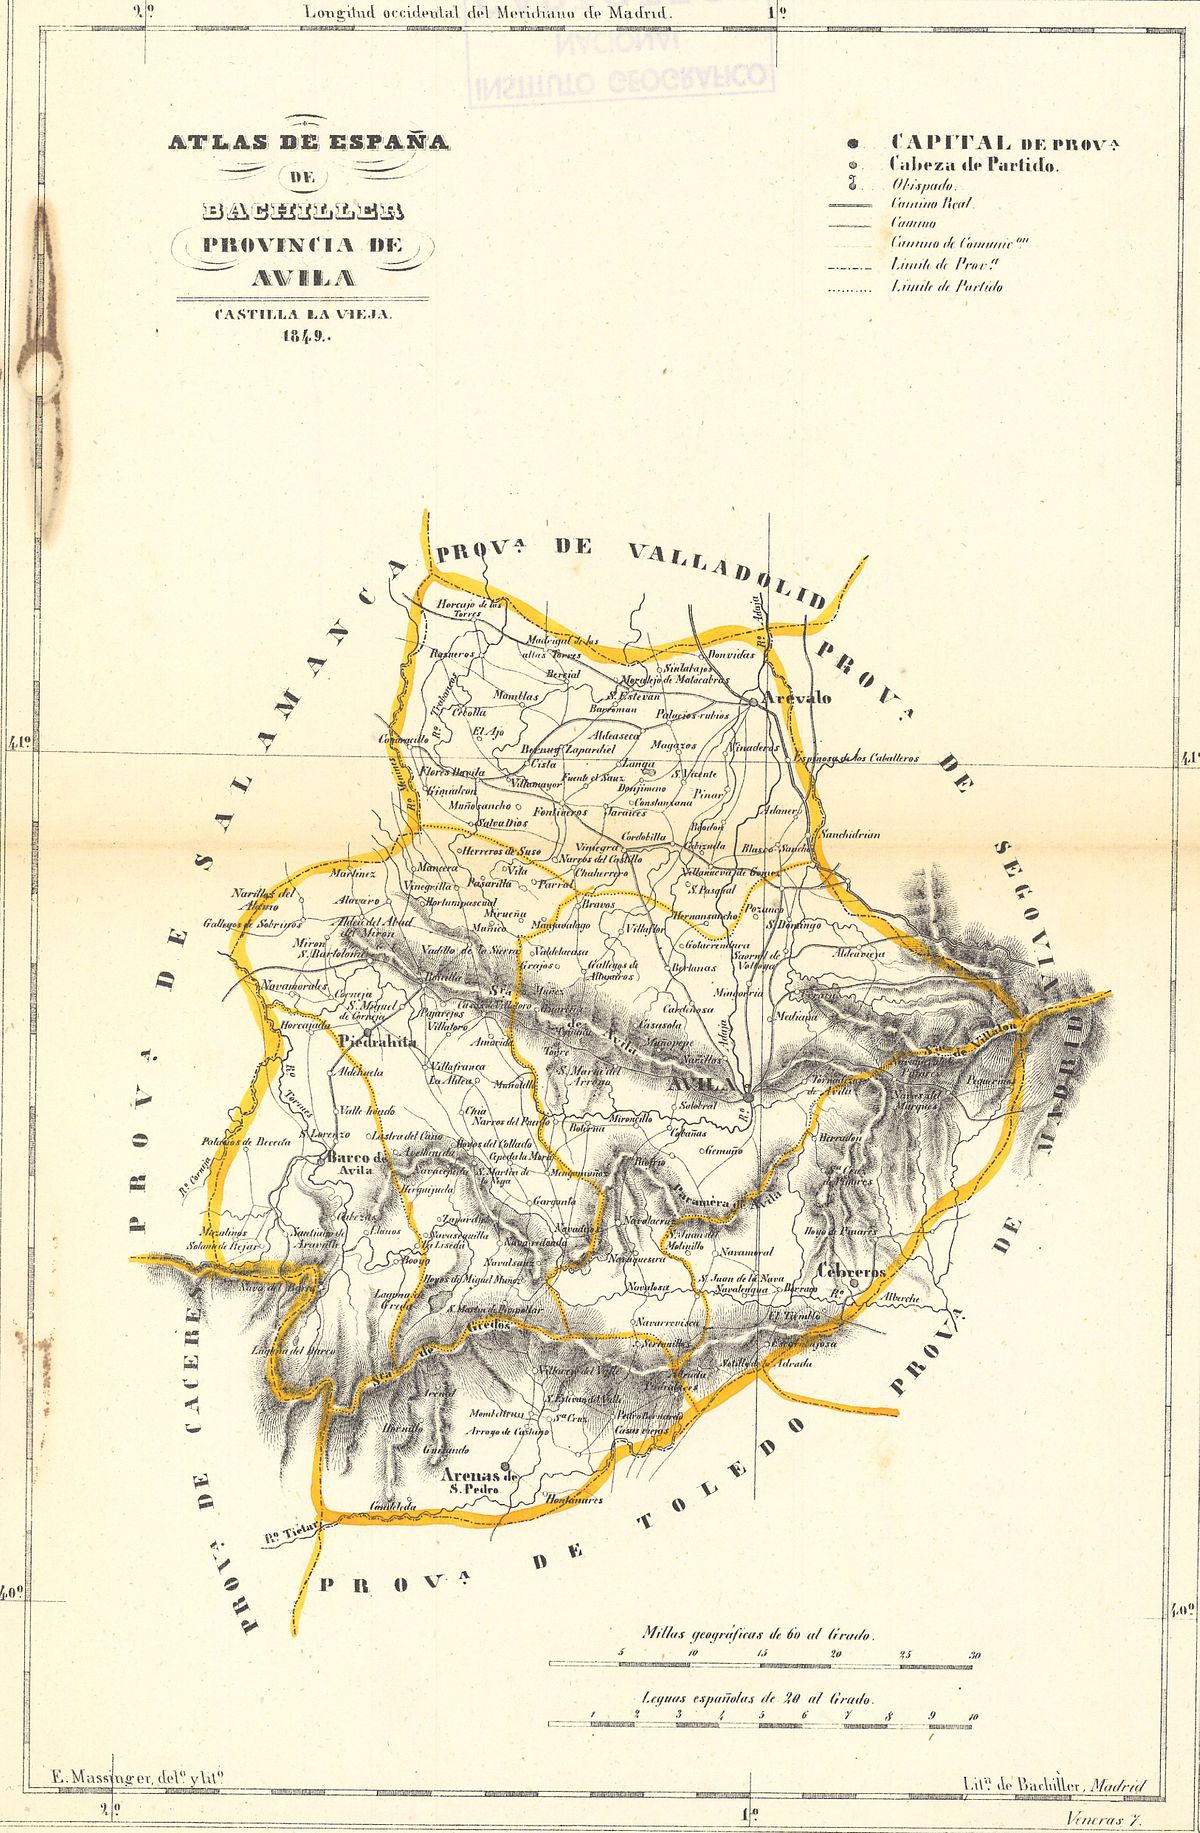 Mapa De Avila Capital.Archivo Mapa De Avila En 1849 Jpg Wikipedia La